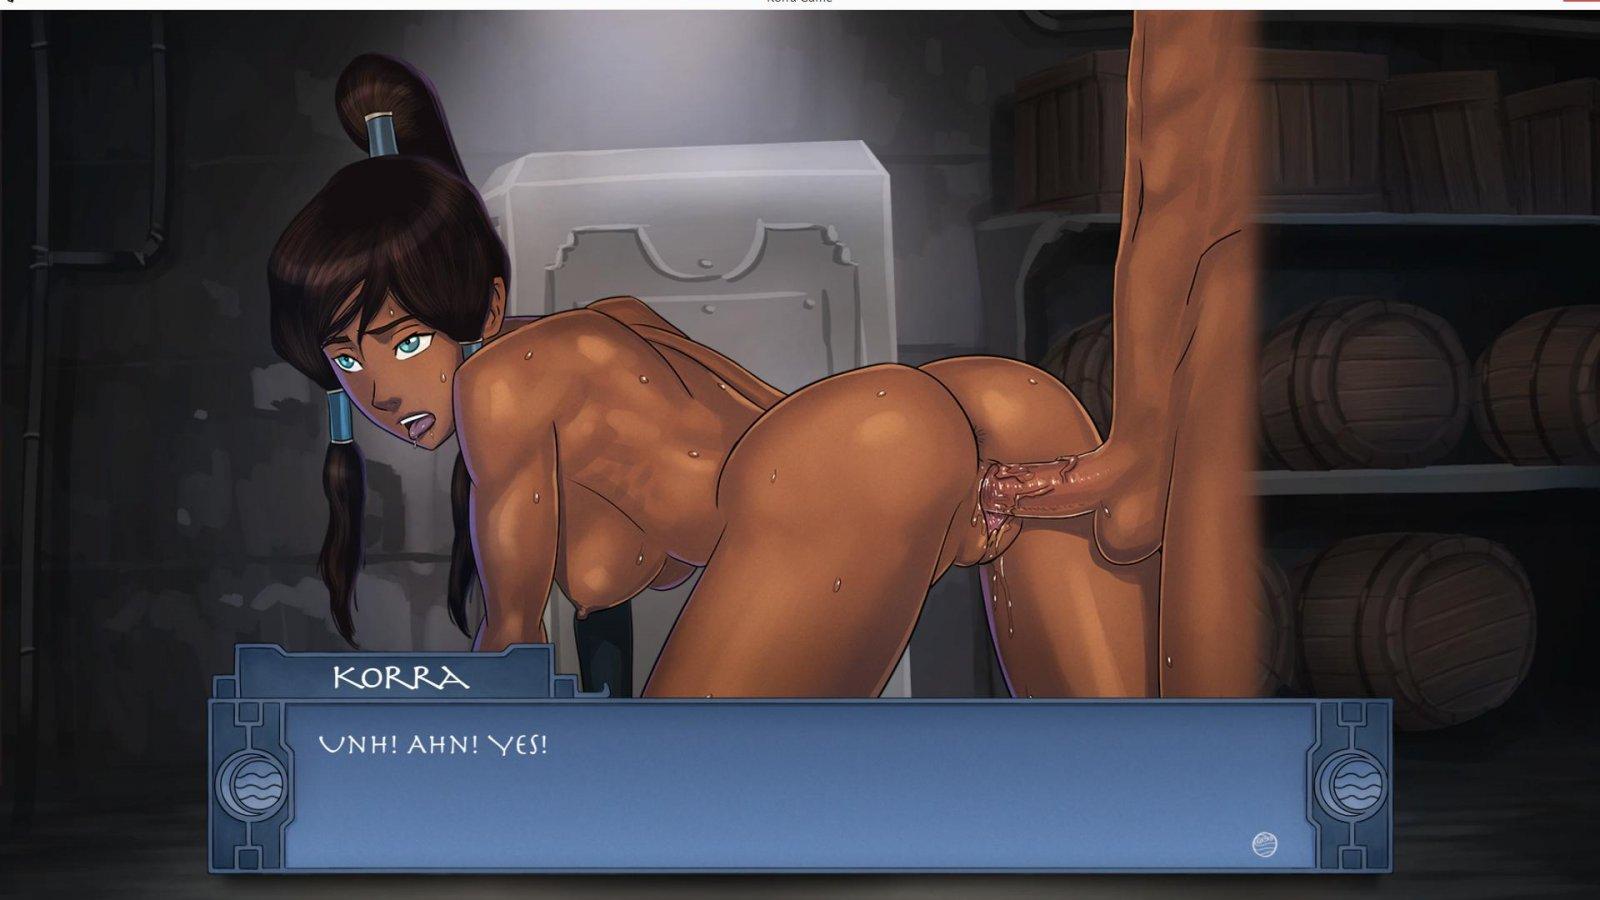 Alanah rae anal sex